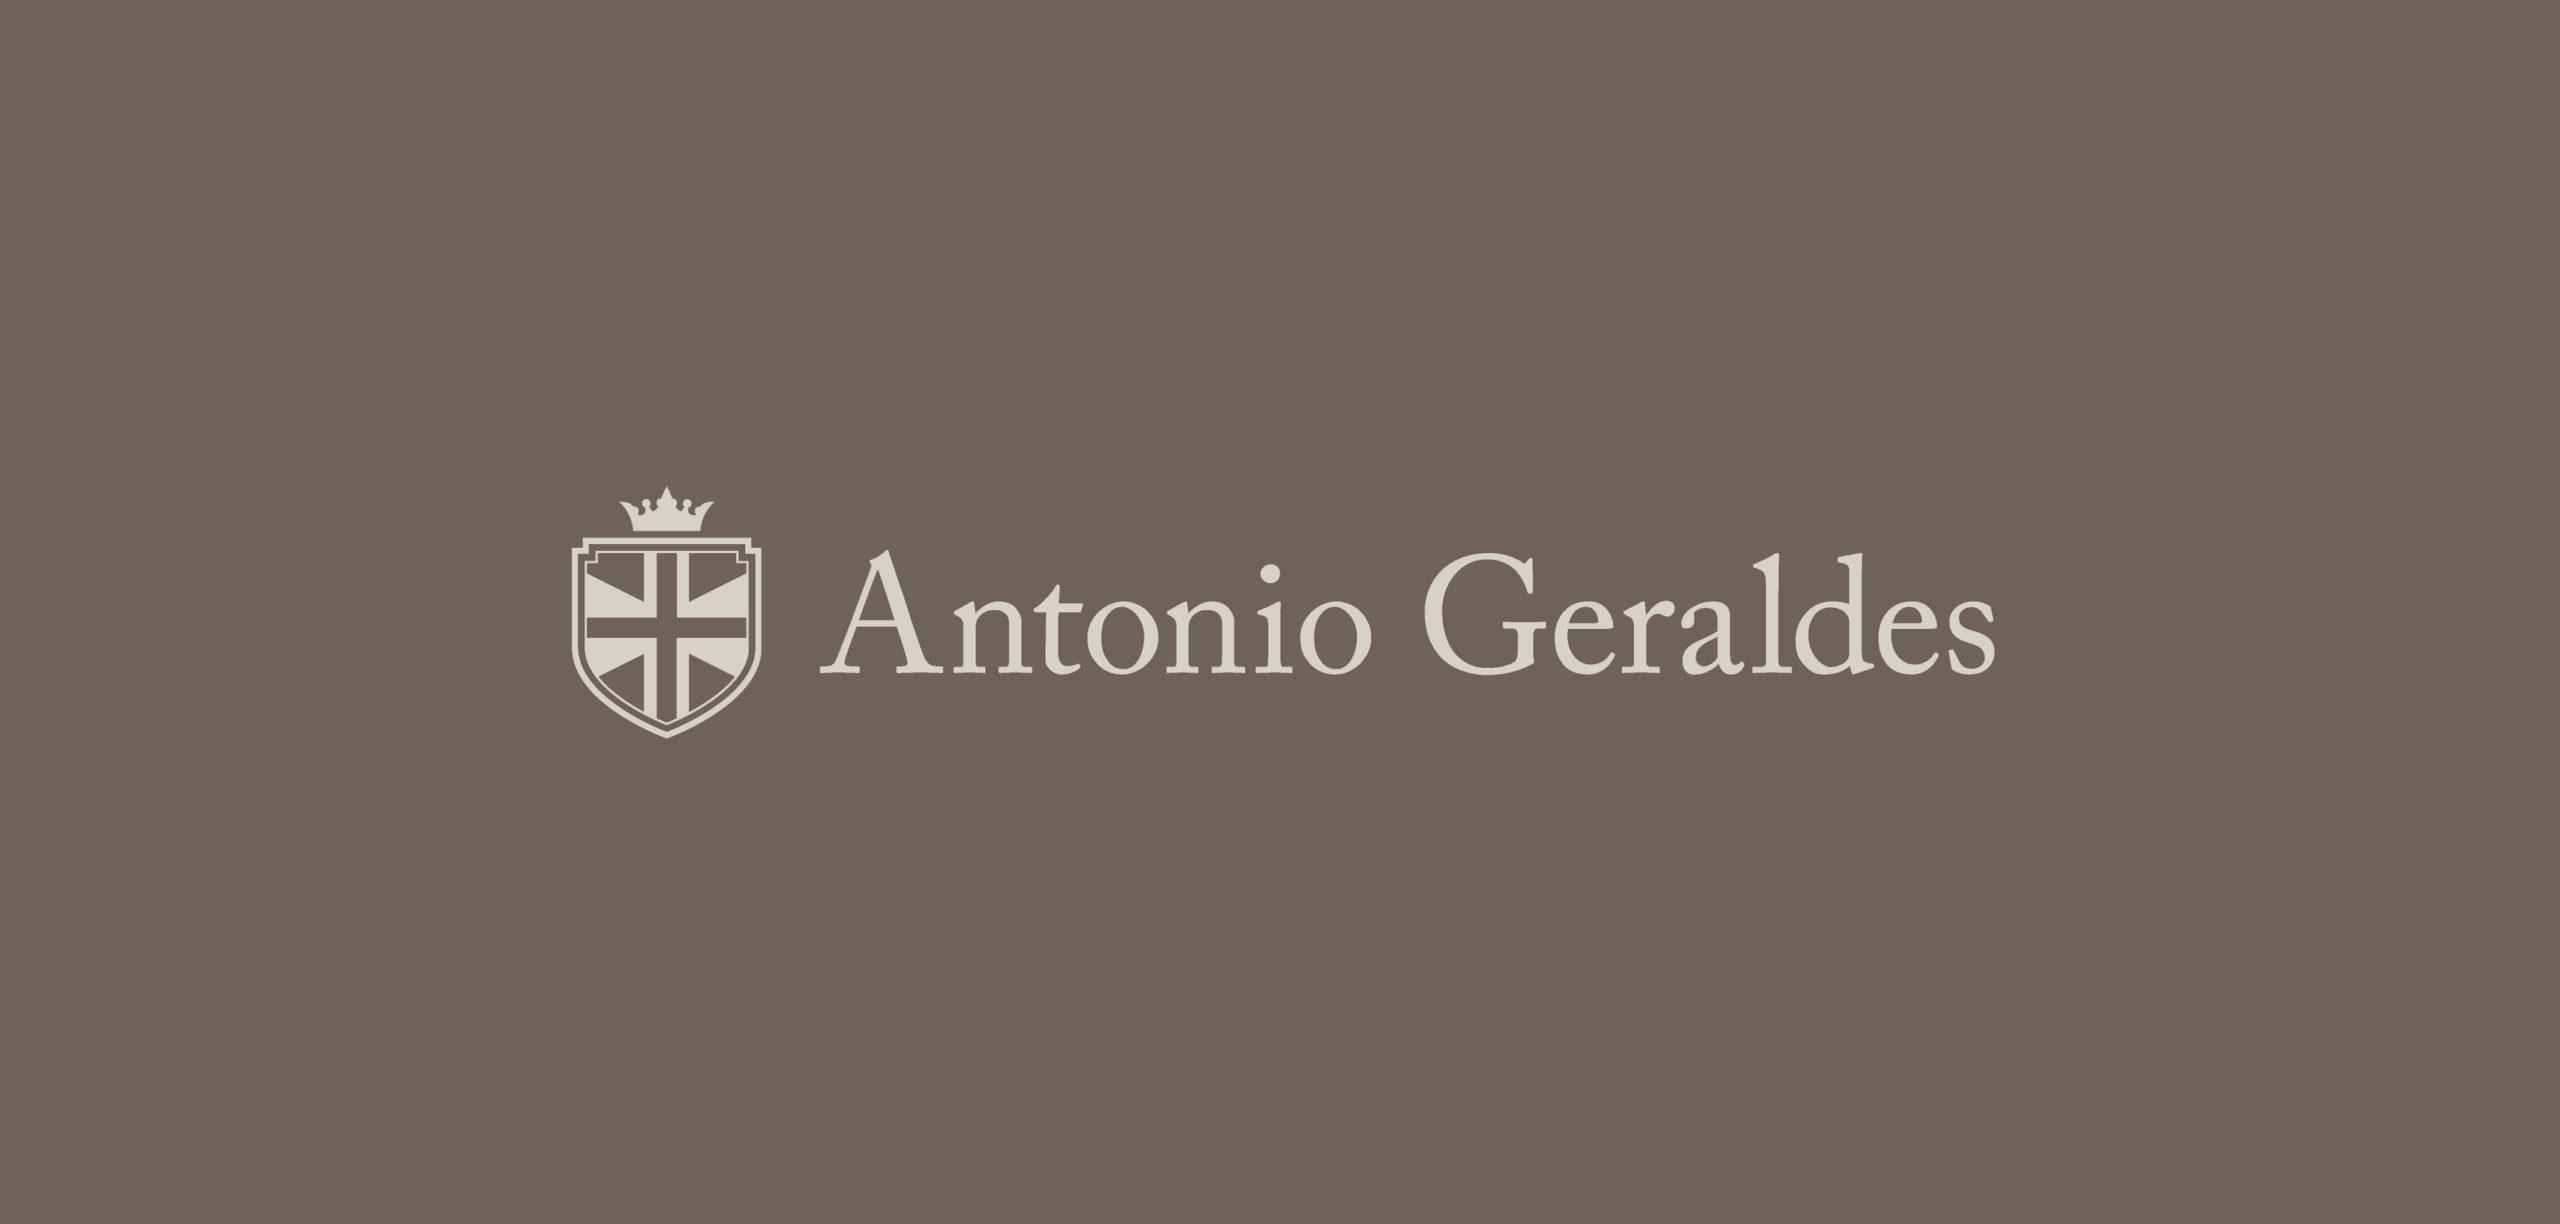 Antonio Geraldes